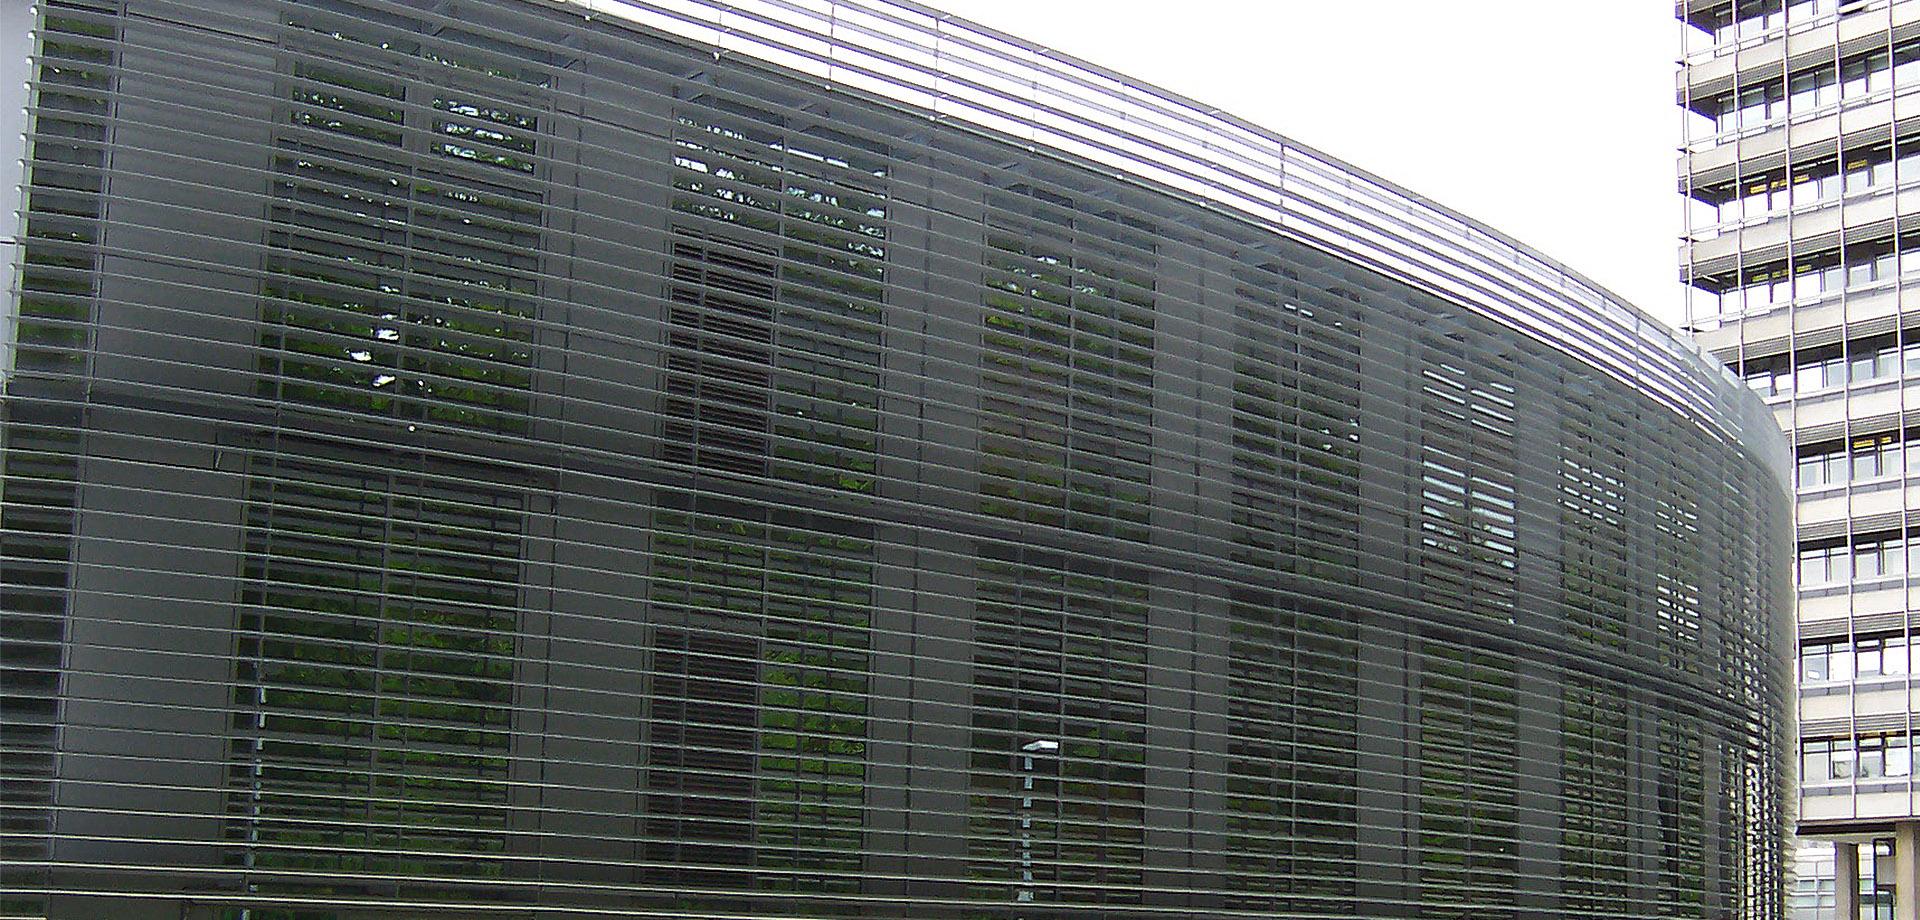 Ihr innovatives Planungsbüro für Metallbau